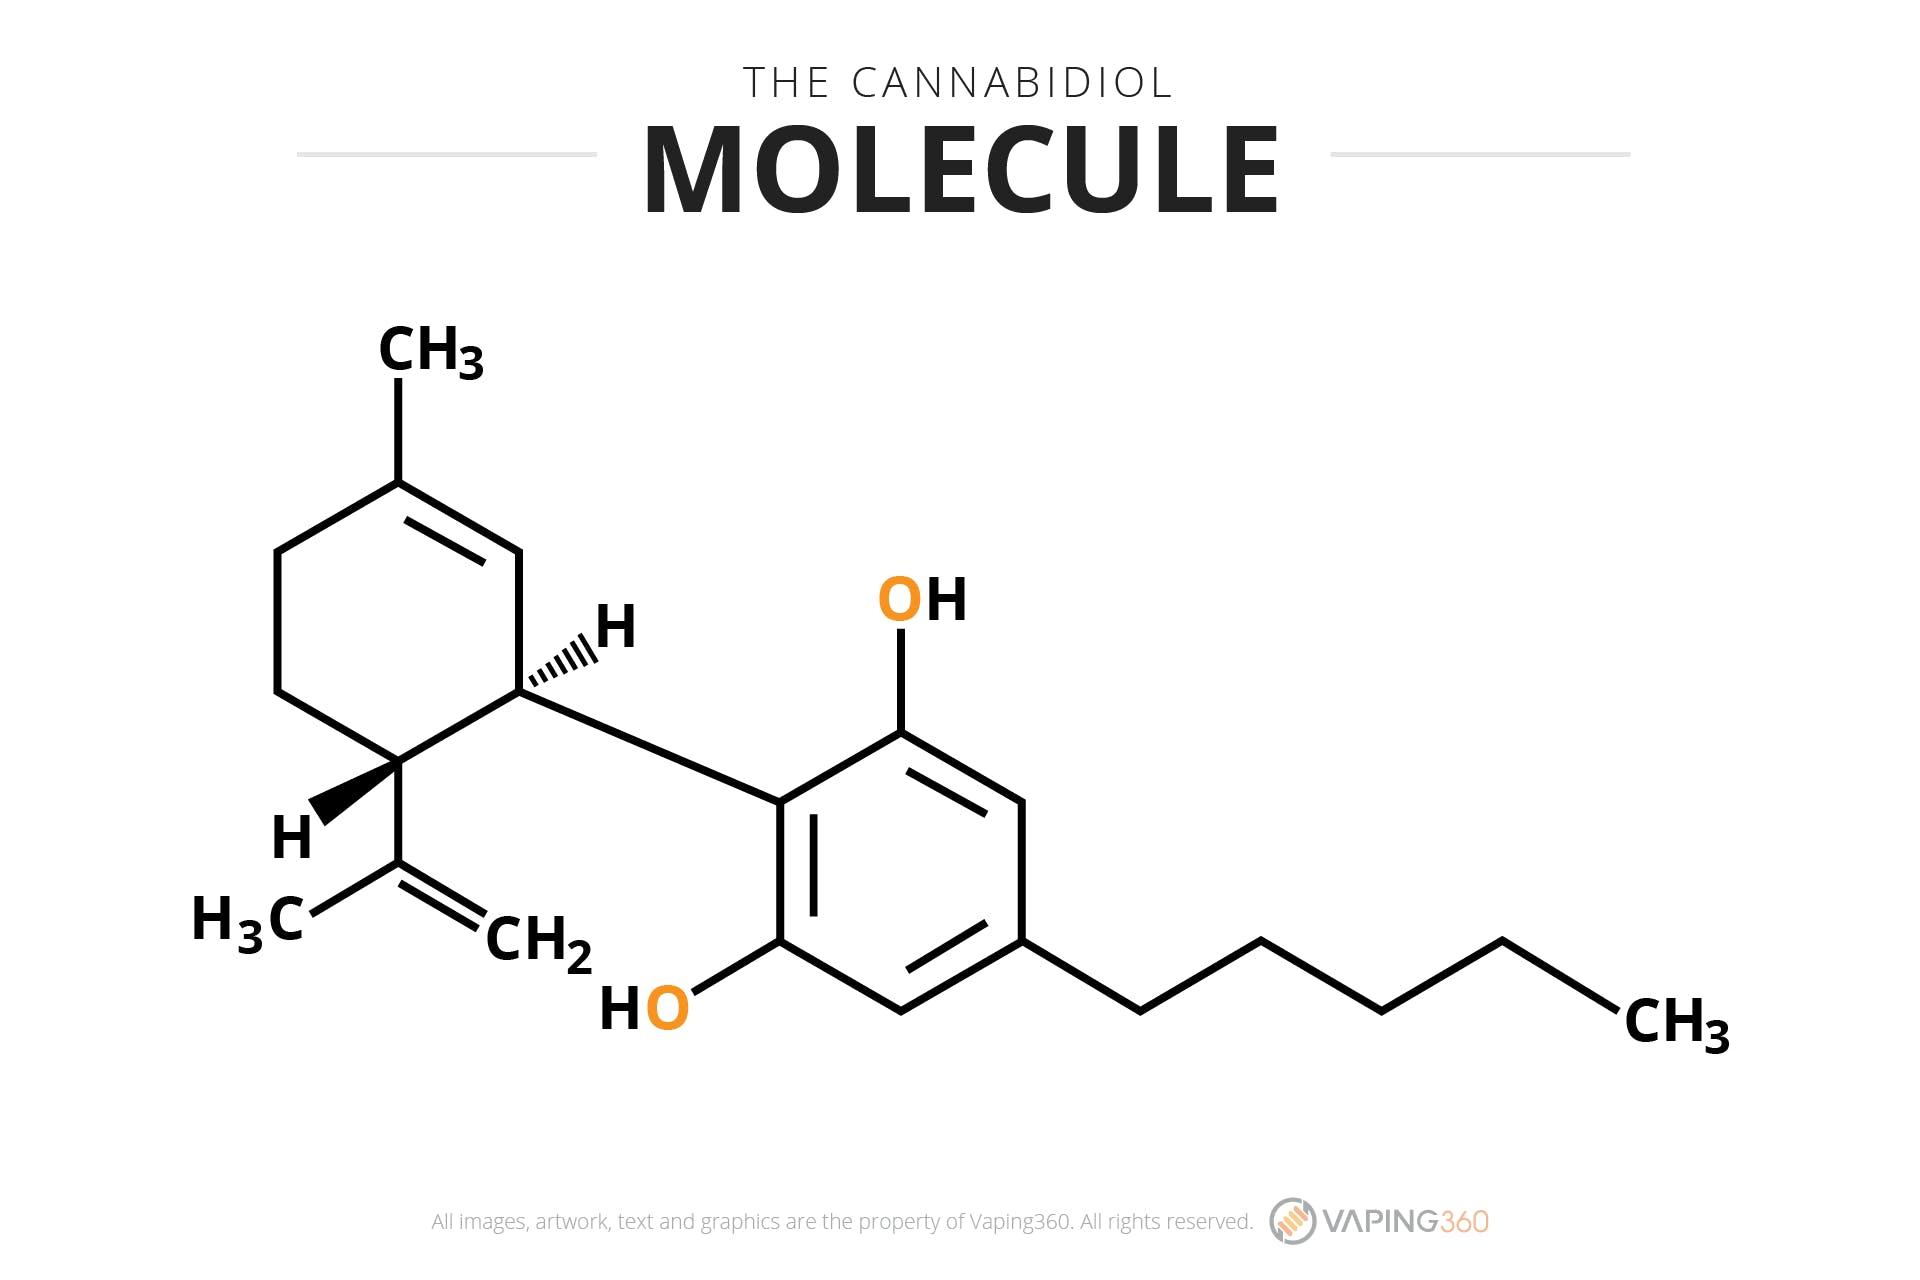 The Cannabidiol Molecule-Infographic